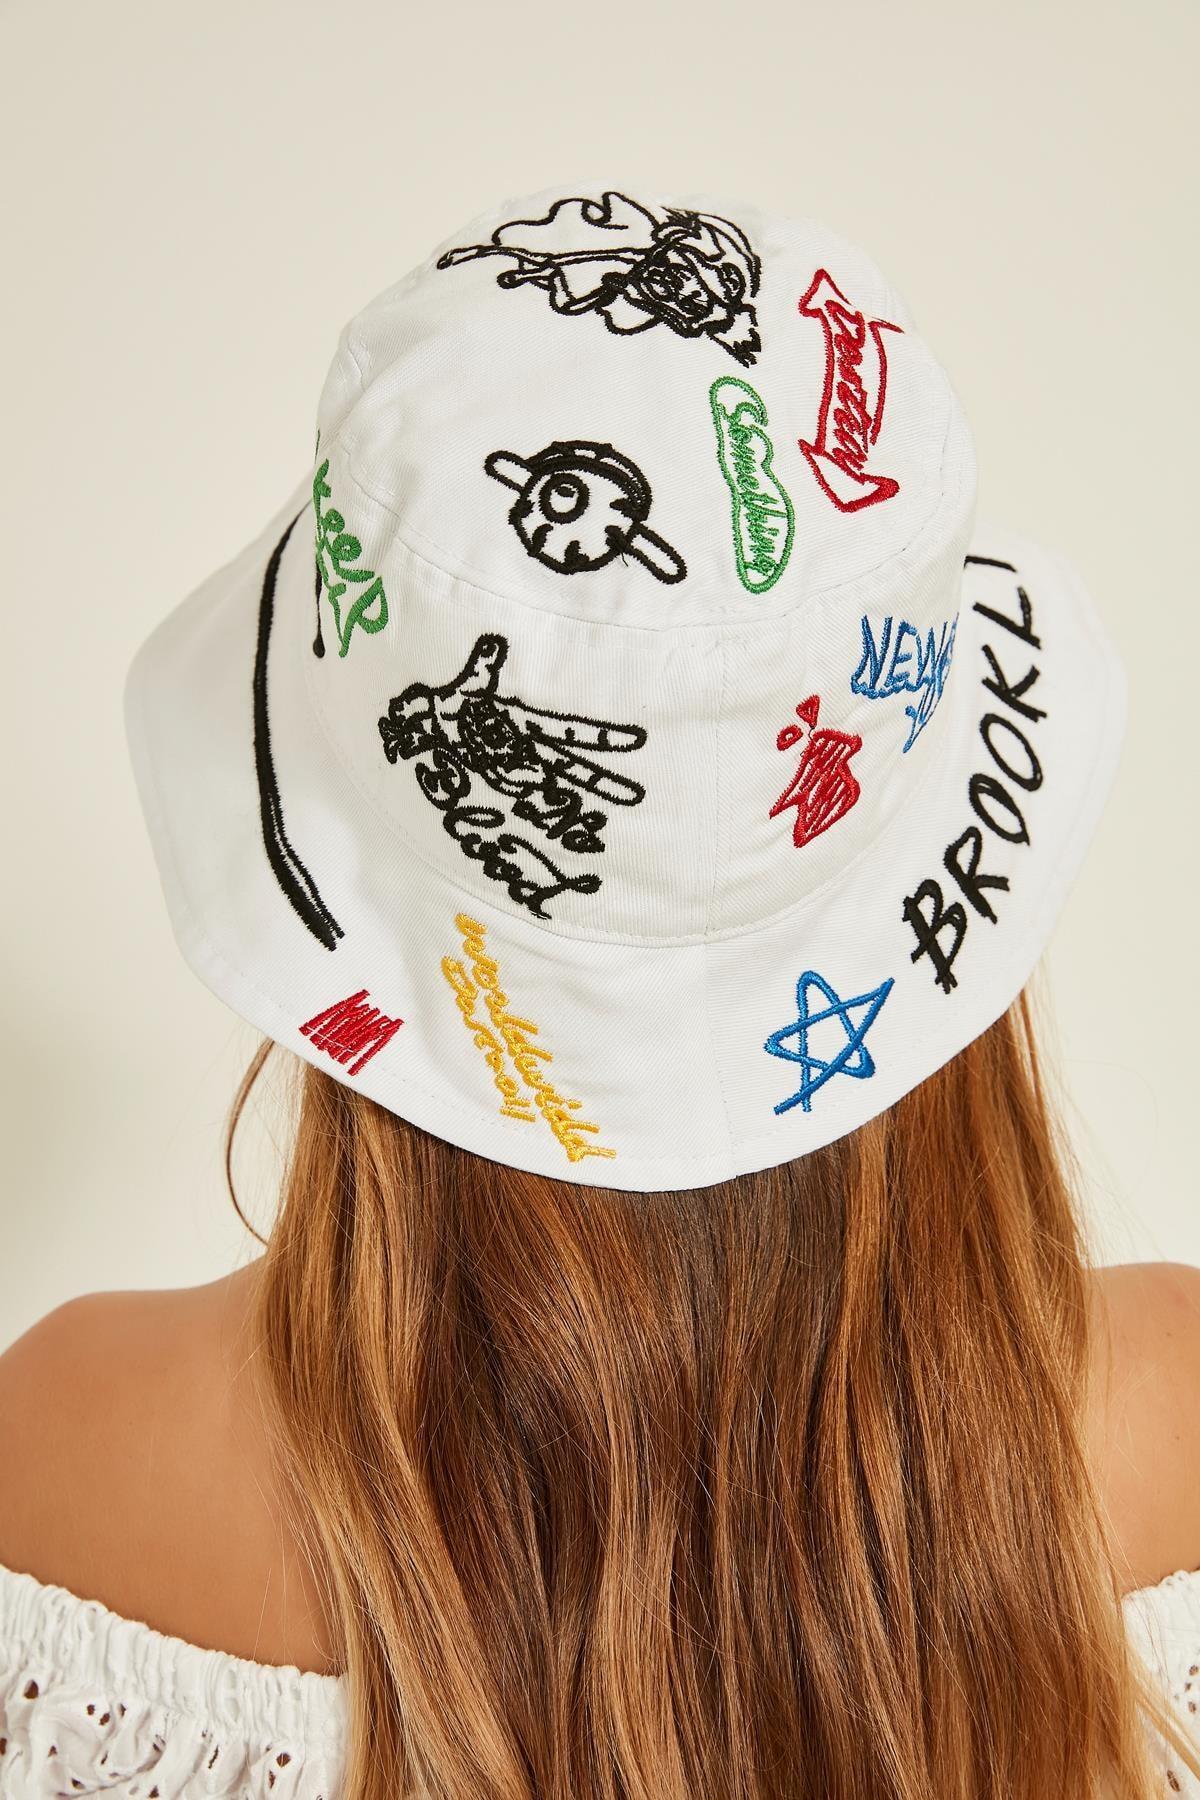 Y-London 13250 Nakış Detaylı Beyaz Bucket Şapka 2